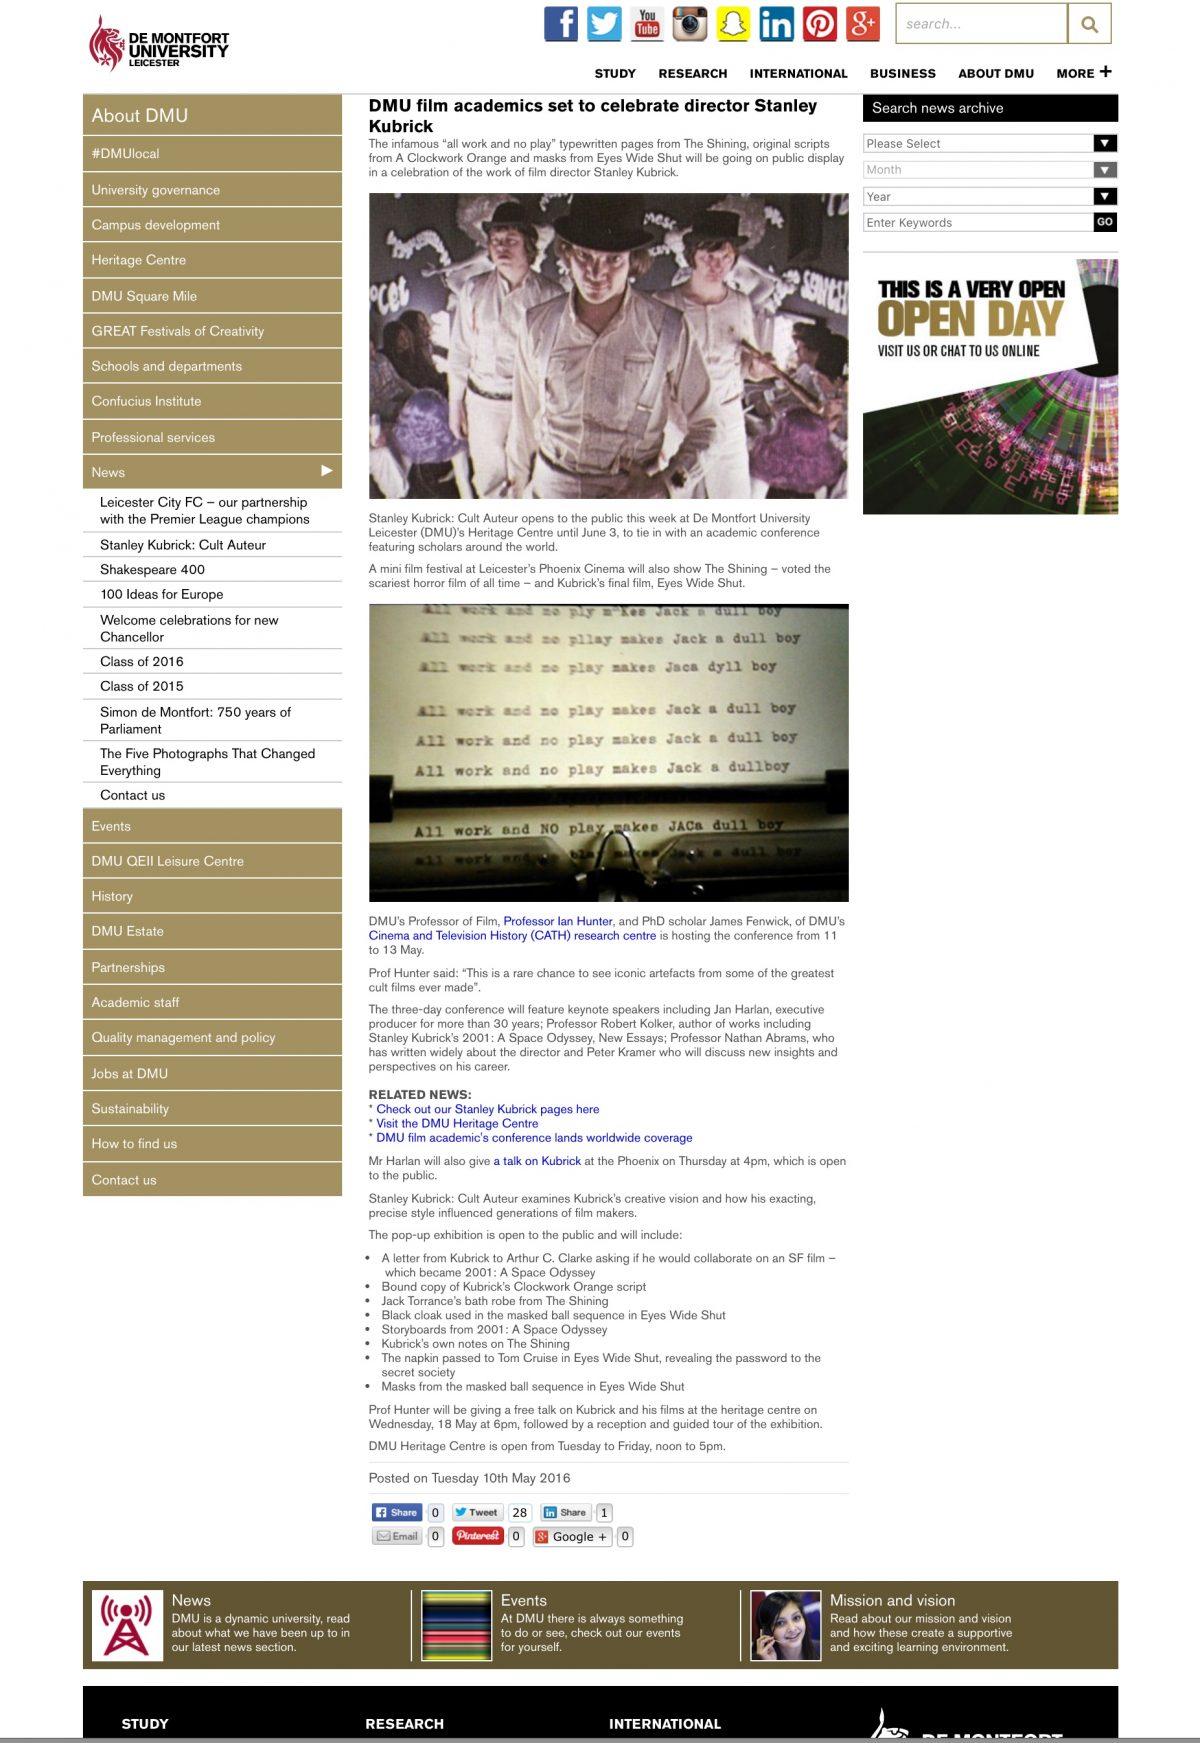 Stanley Kubrick: A Retrospective 11 – 13 May 2016 De Montfort University, Leicester